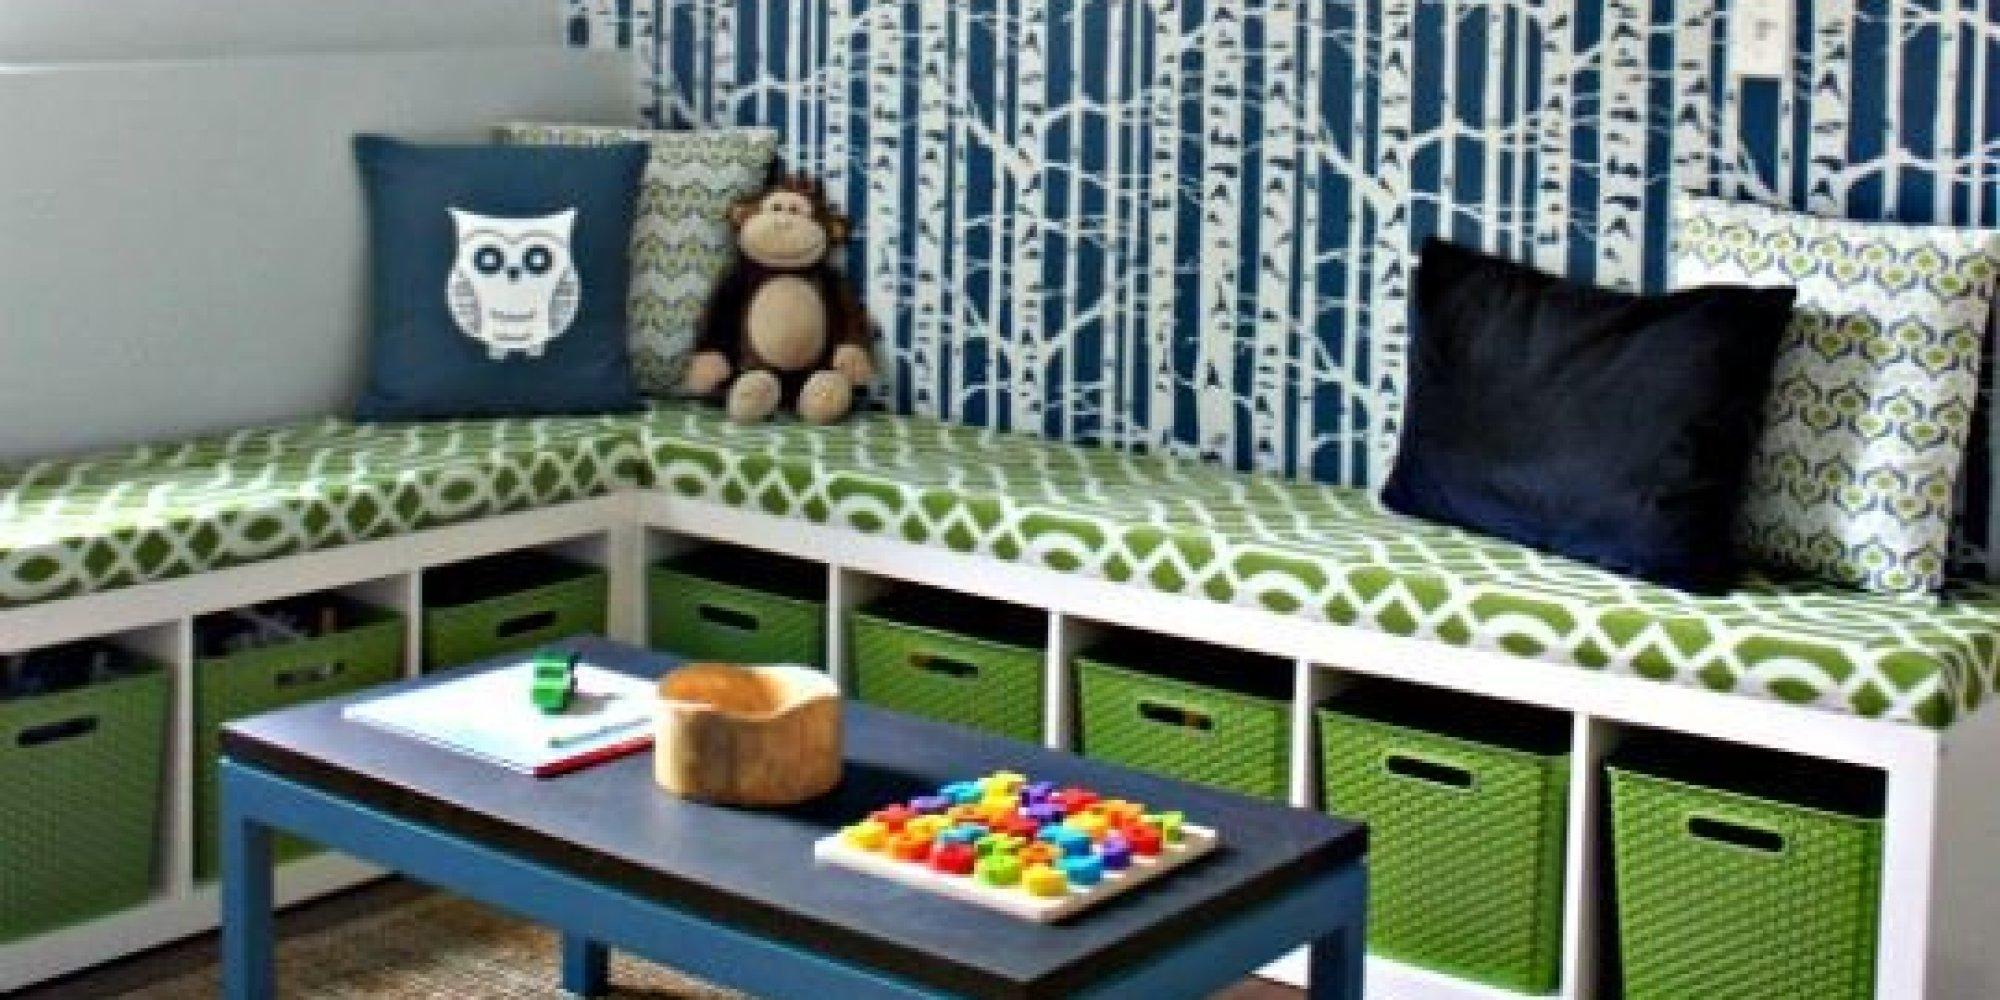 Ikea planea dejar de fabricar expedit c mo personalizar - Mueble ikea expedit ...